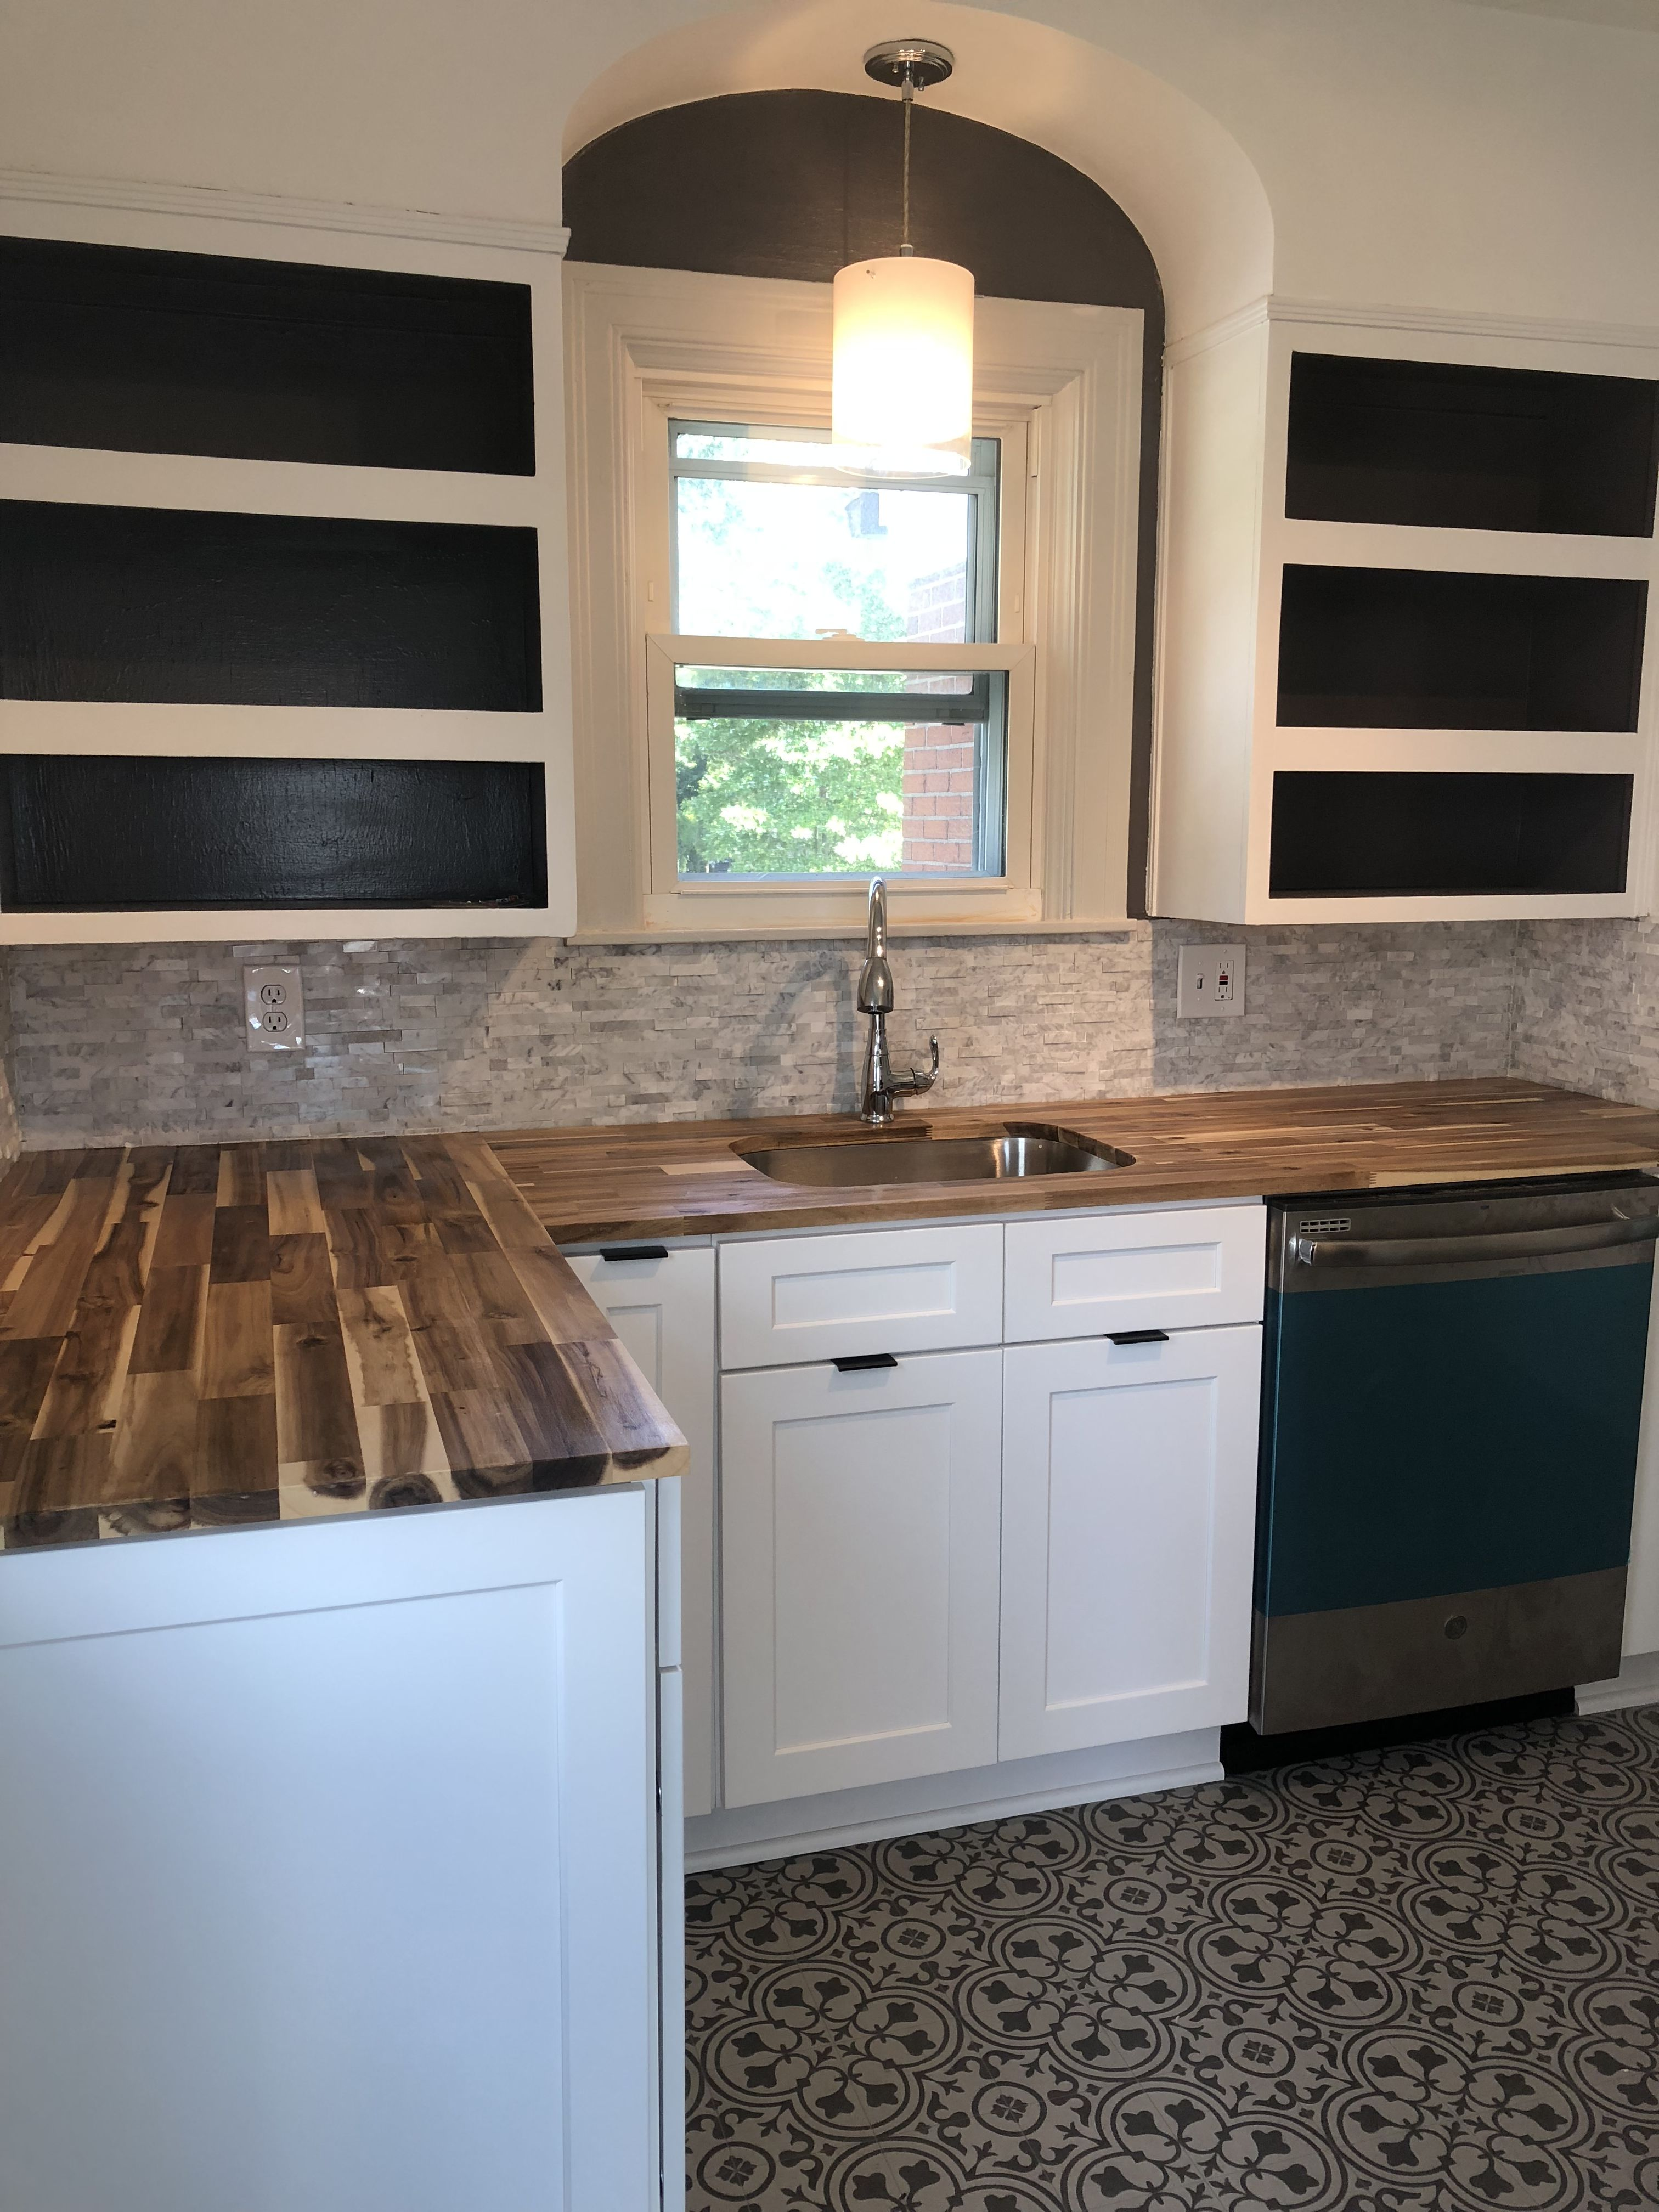 Small Kitchen Remodel Kitchen Remodel Small Kitchen Design Open Kitchen Design Small